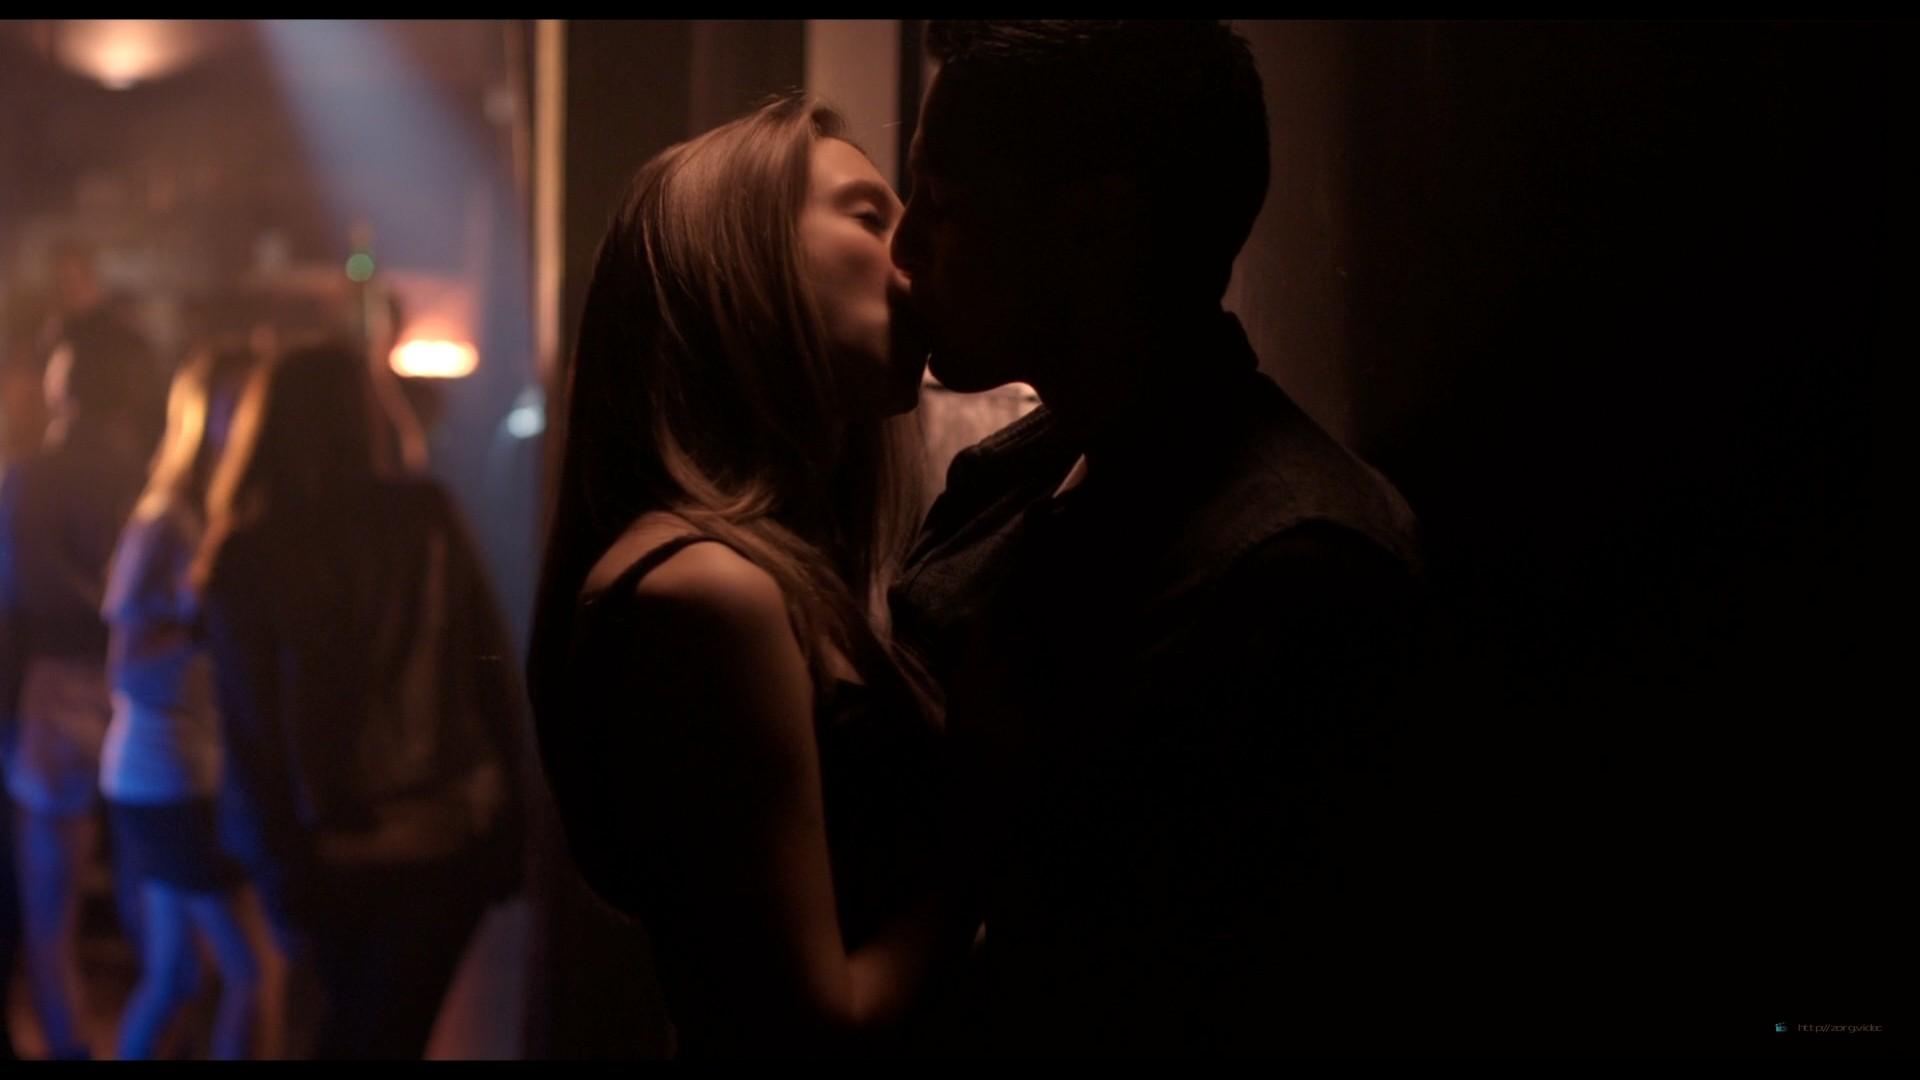 Emma Watson hot Taissa Farmiga and others sexy - The Bling Ring (2013) HD 1080p BluRay (12)